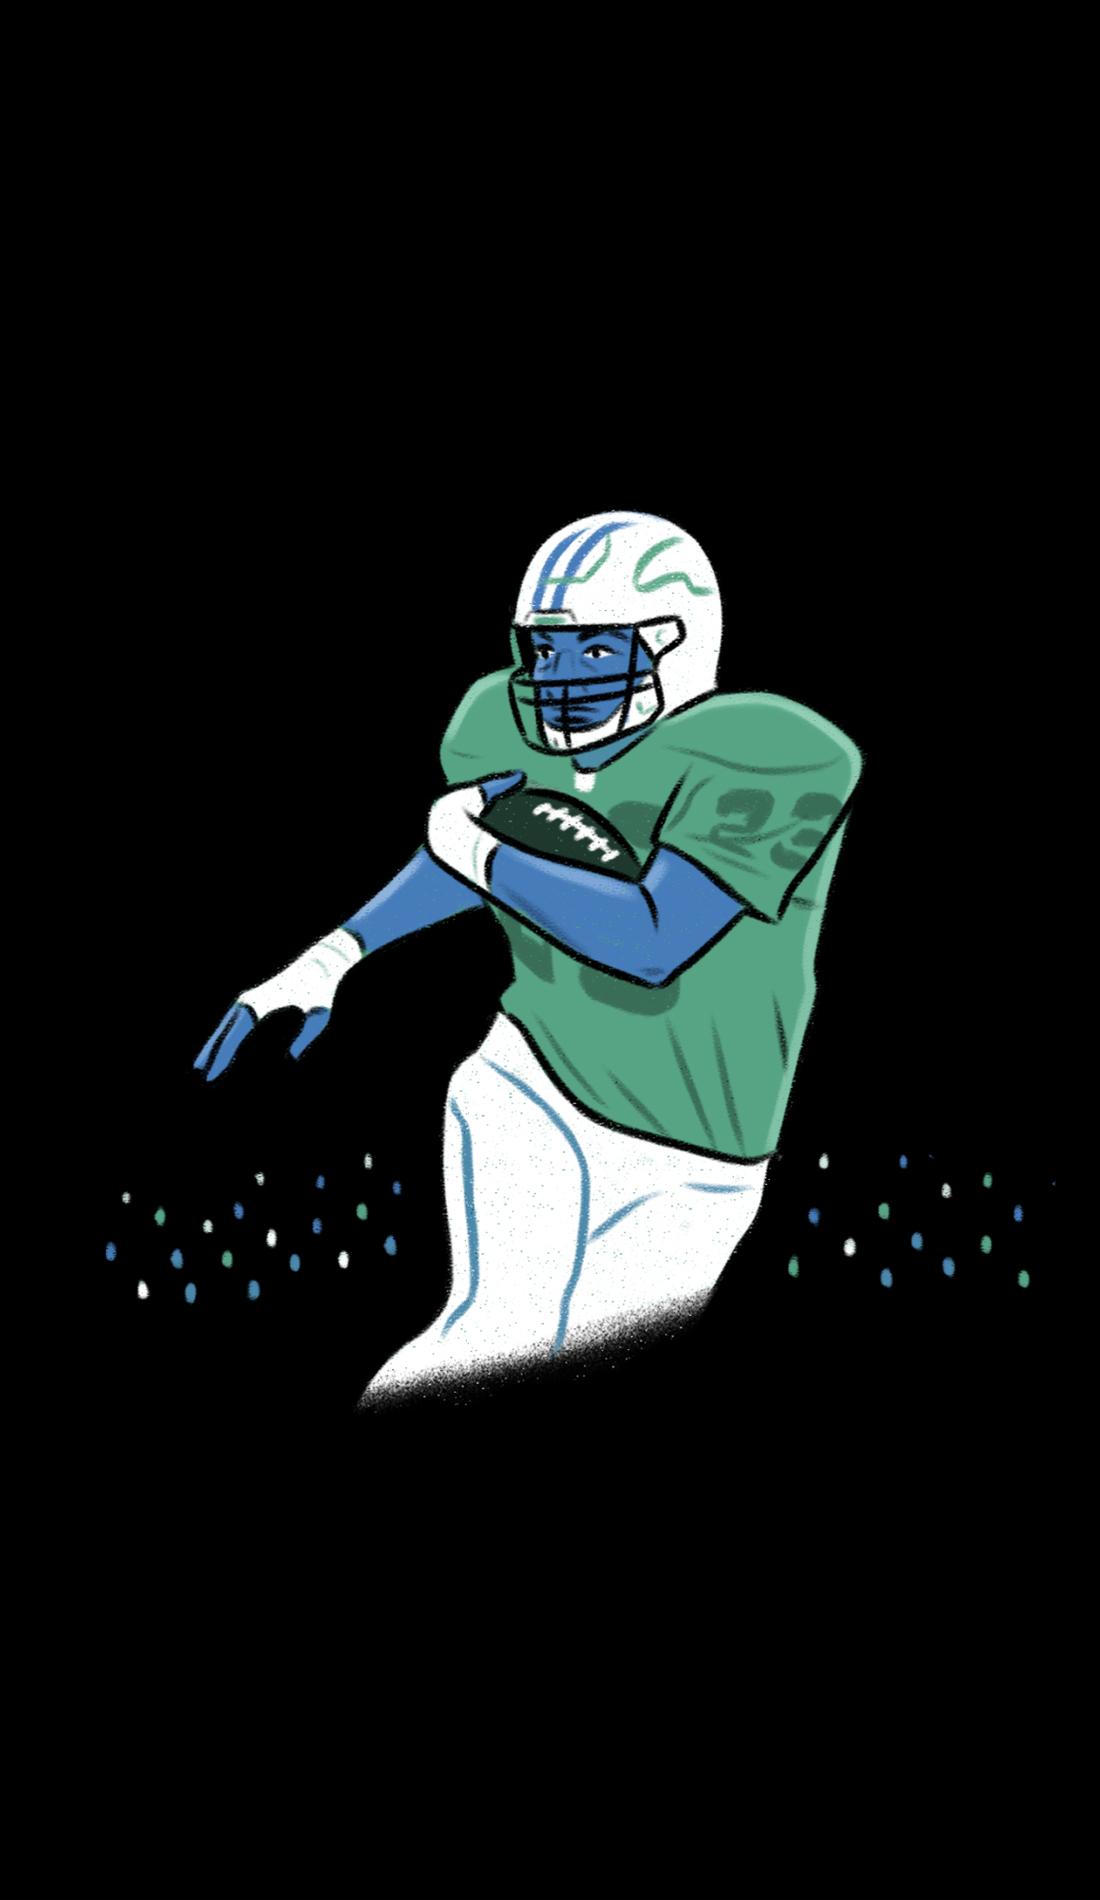 A South Dakota State Jackrabbits Football live event